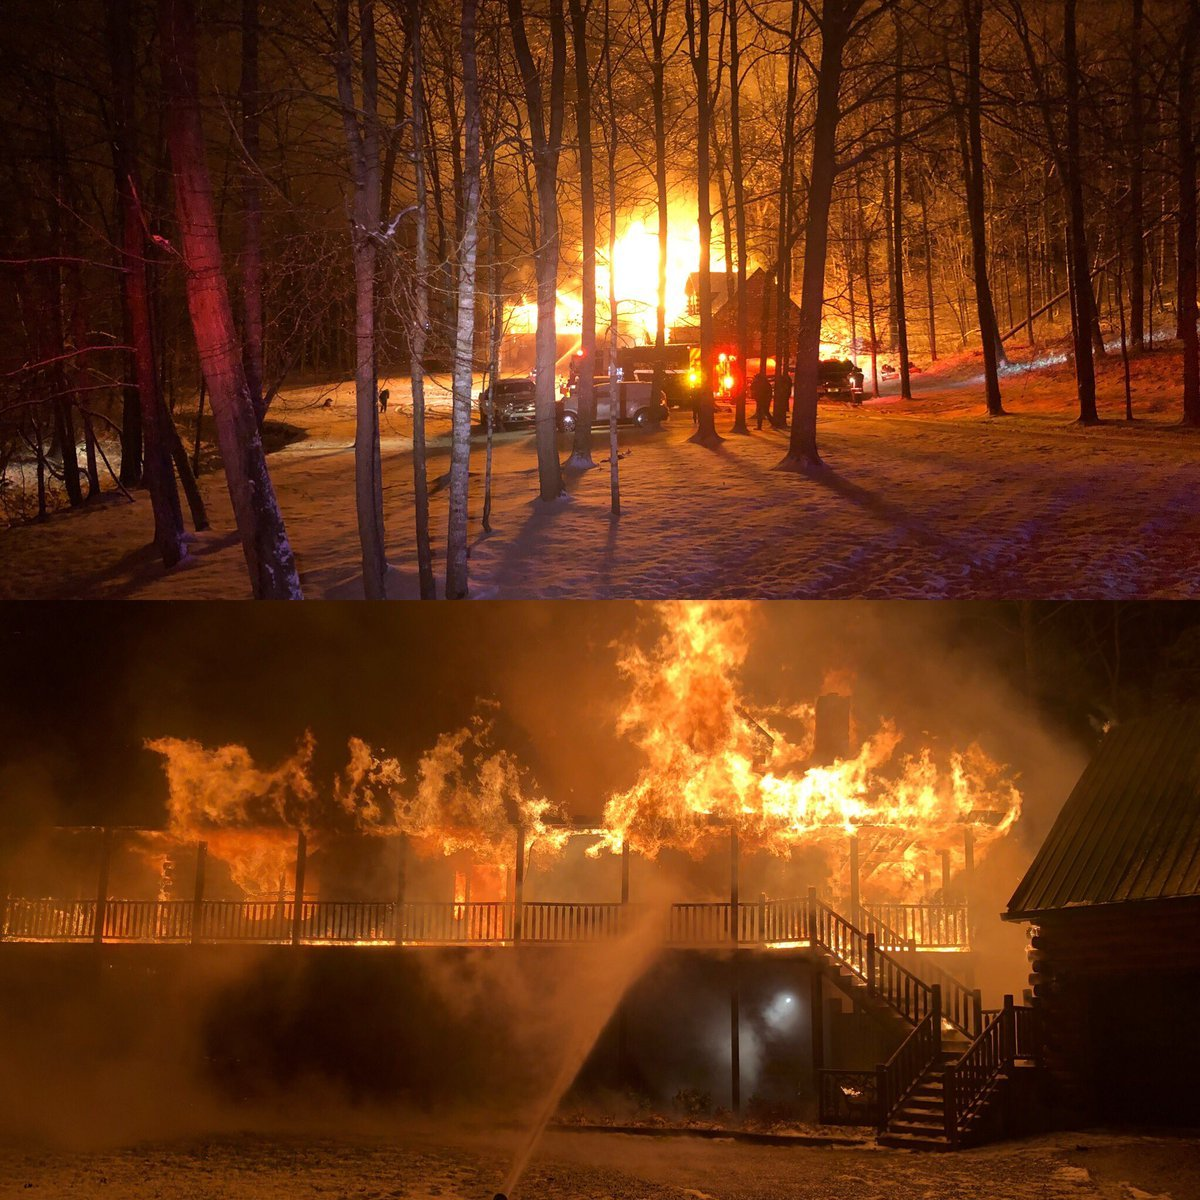 Flames burn through a home on Big Country Road East in Bullitt County, Saturday, Jan. 13, 2018. Shepherdsville Fire Dept. photos via Twitter.